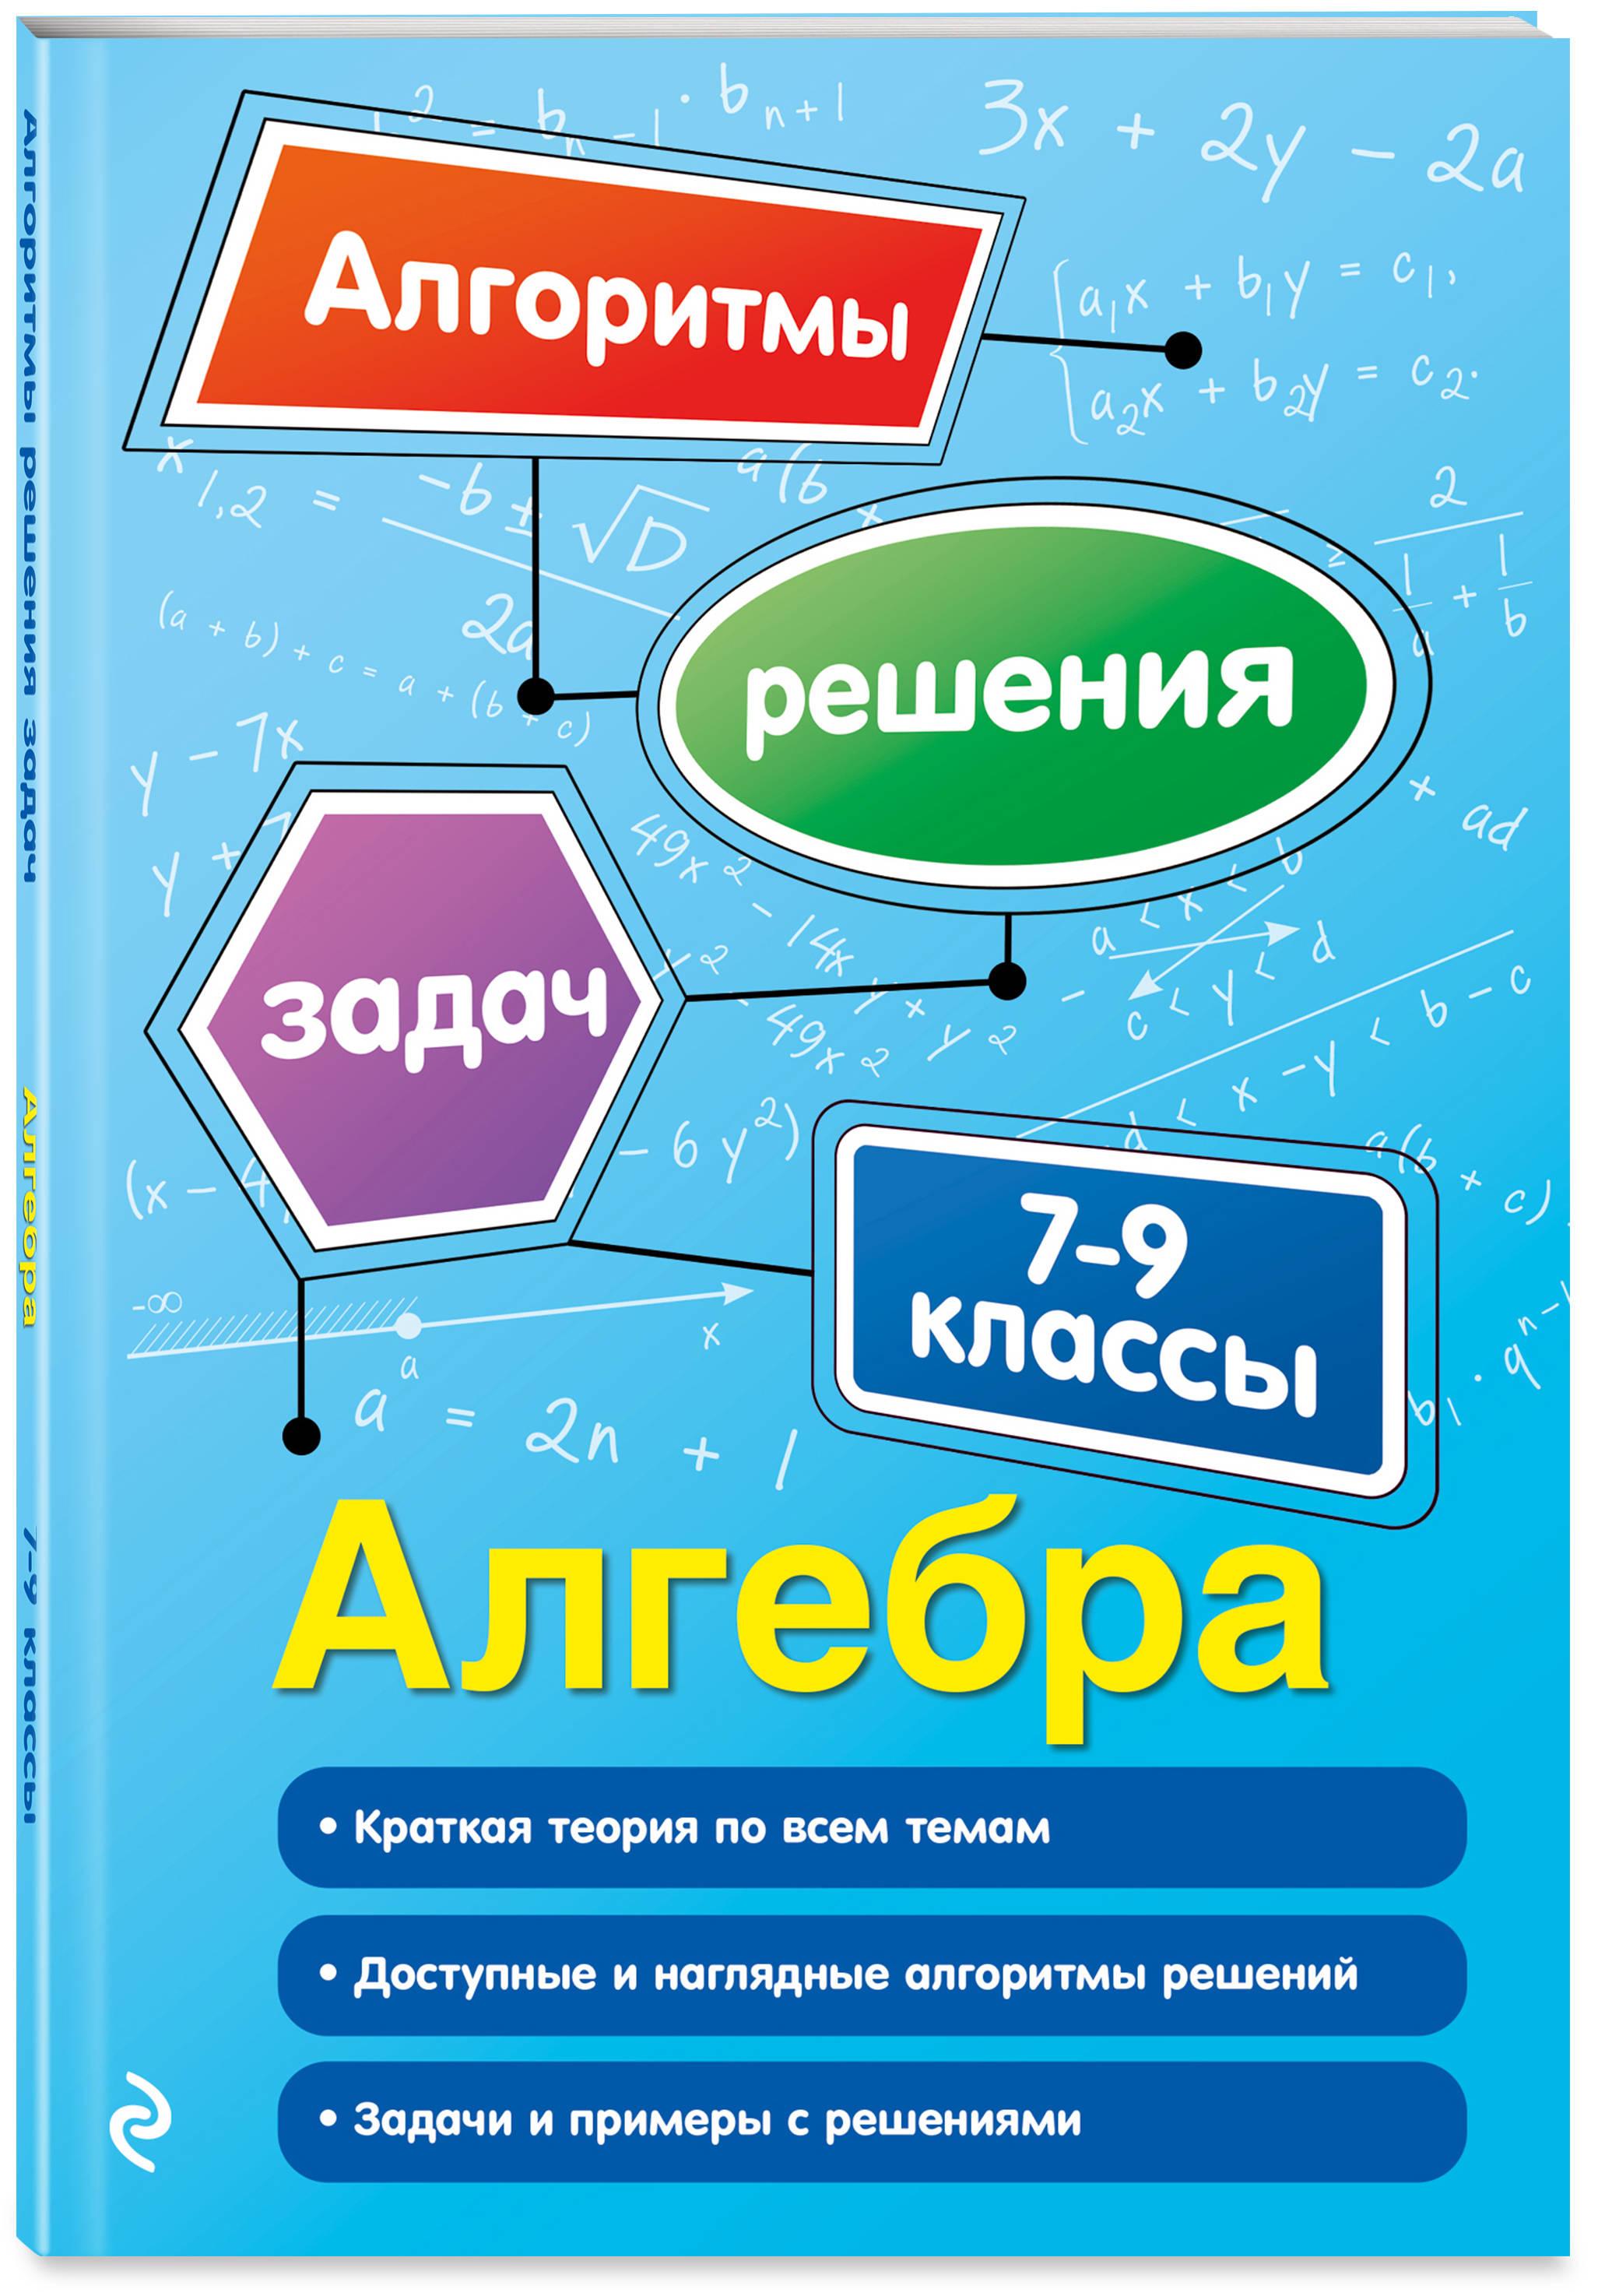 Т. М. Виноградова Алгебра. 7-9 классы виноградова т алгебра 7 9 классы